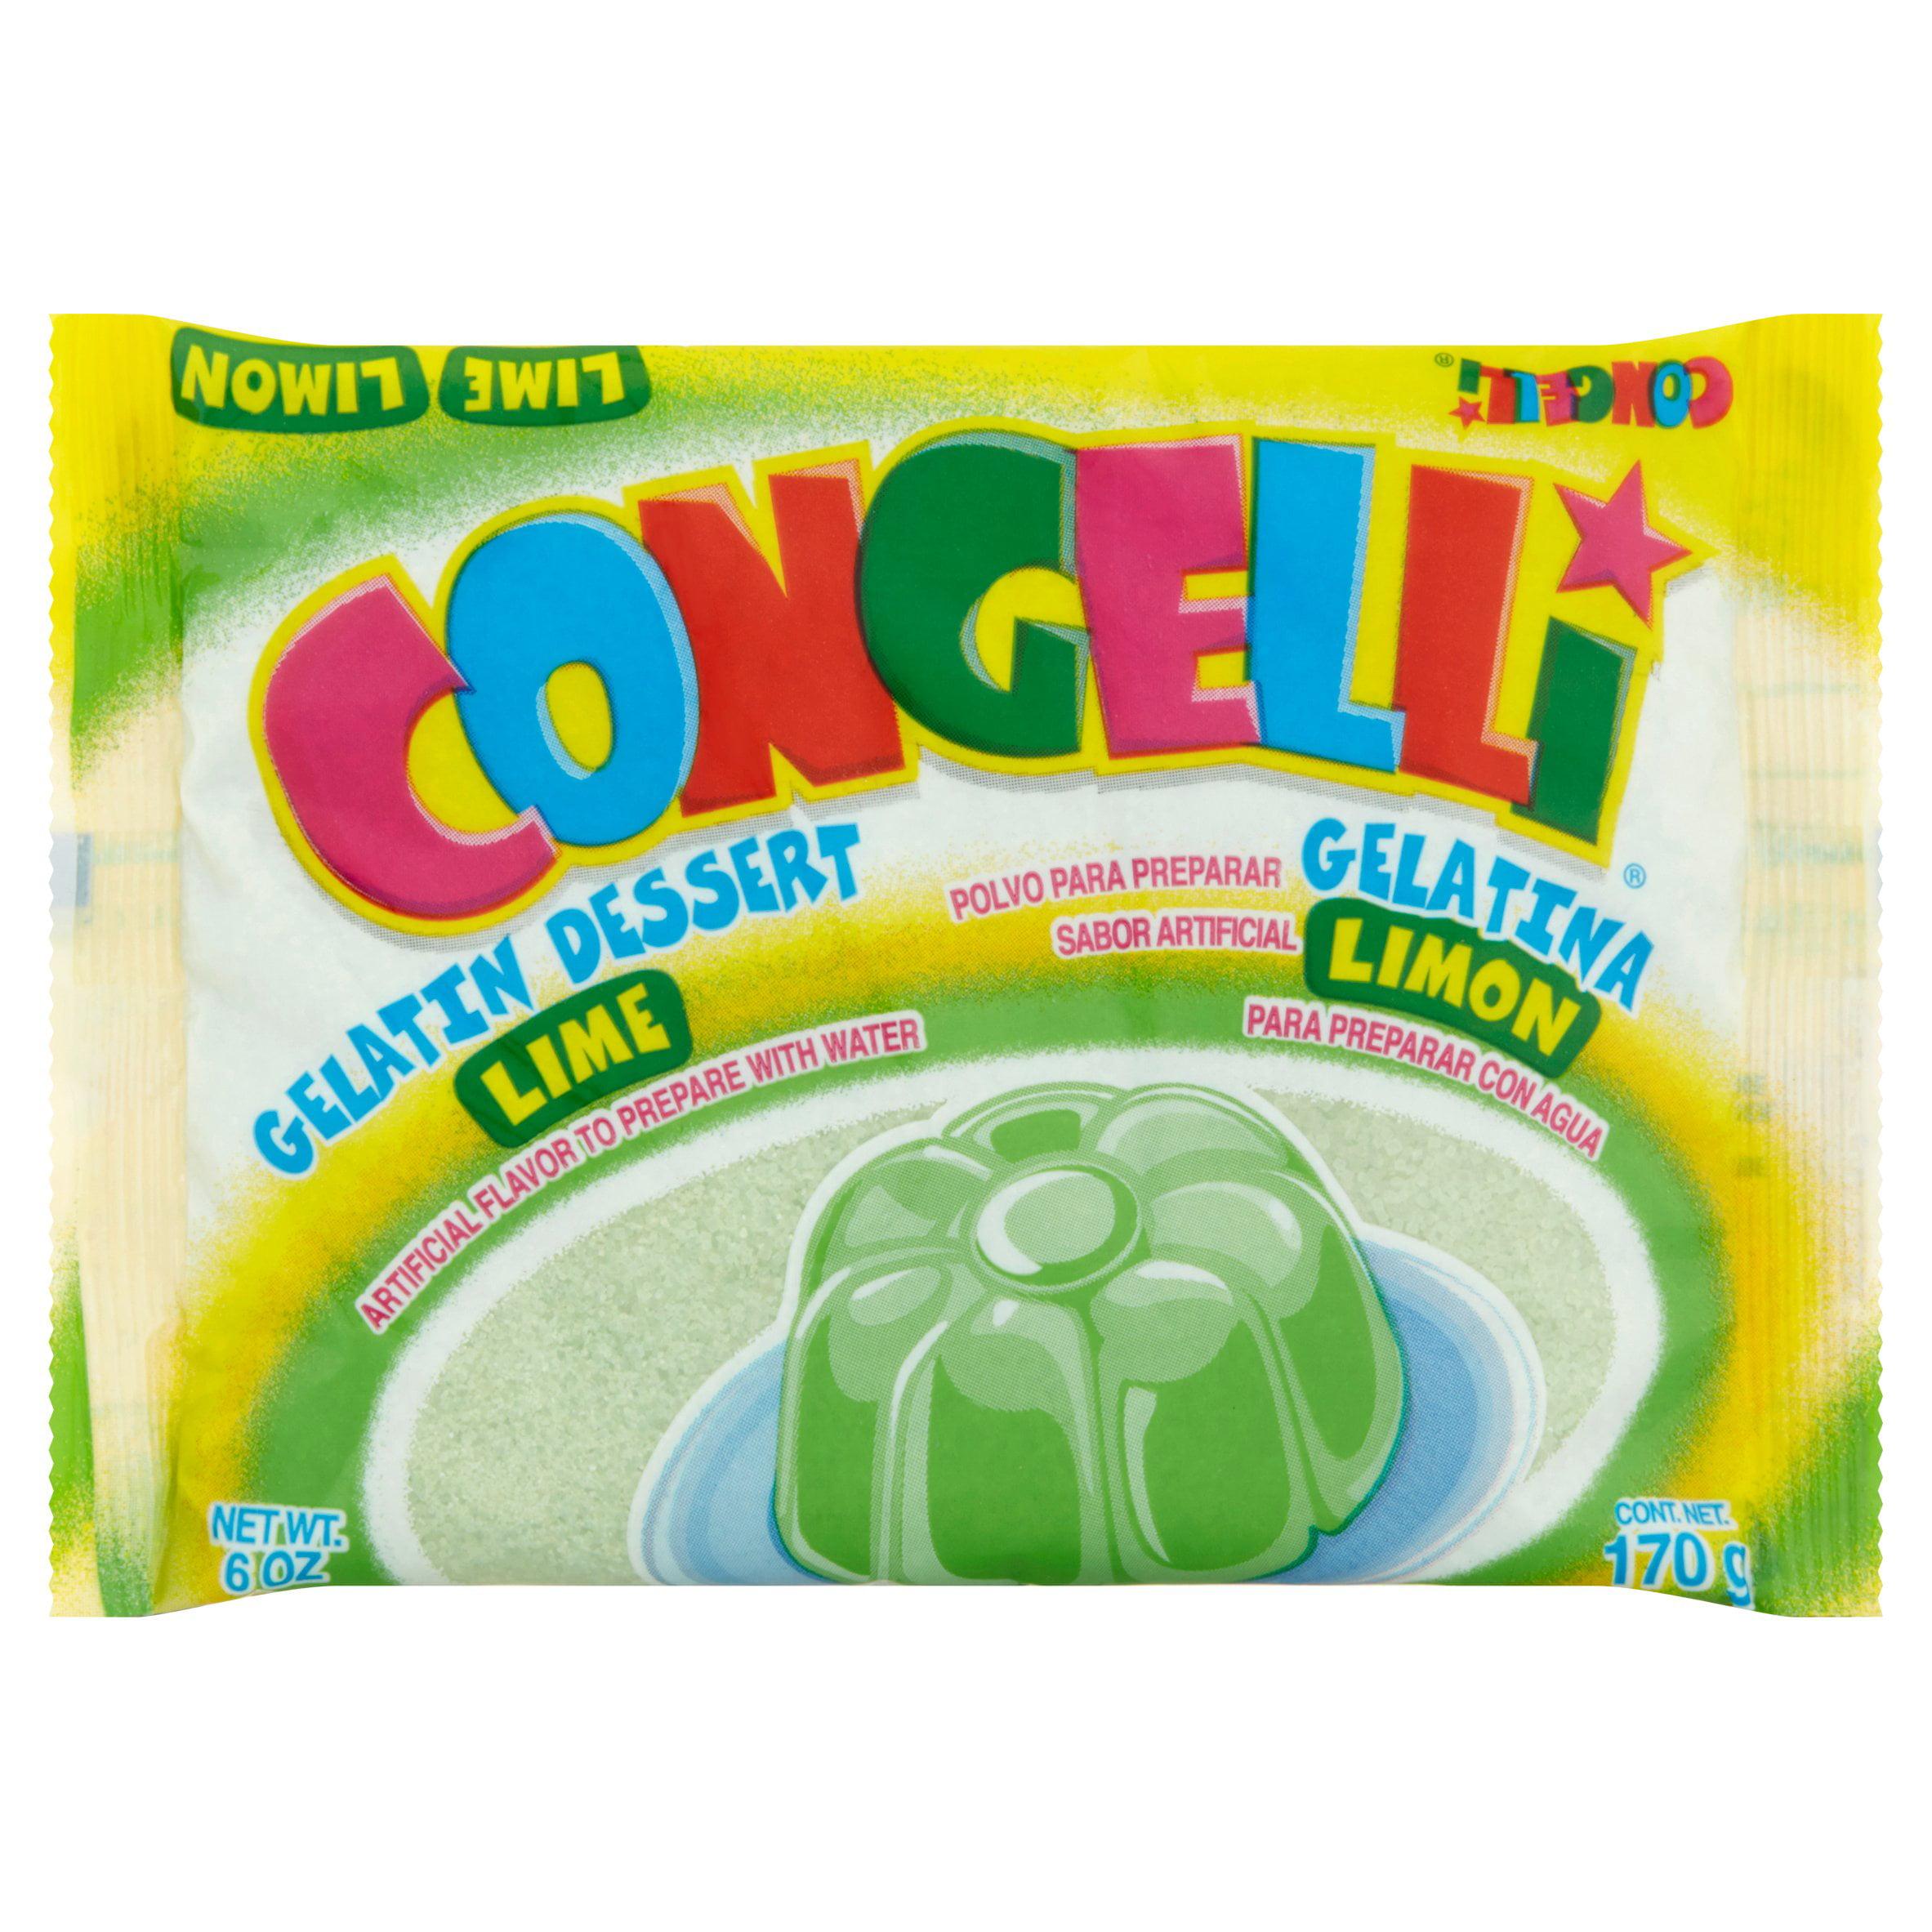 (5 Pack) Congelli® Lime Water Based Gelatin Dessert 6 oz. Pack